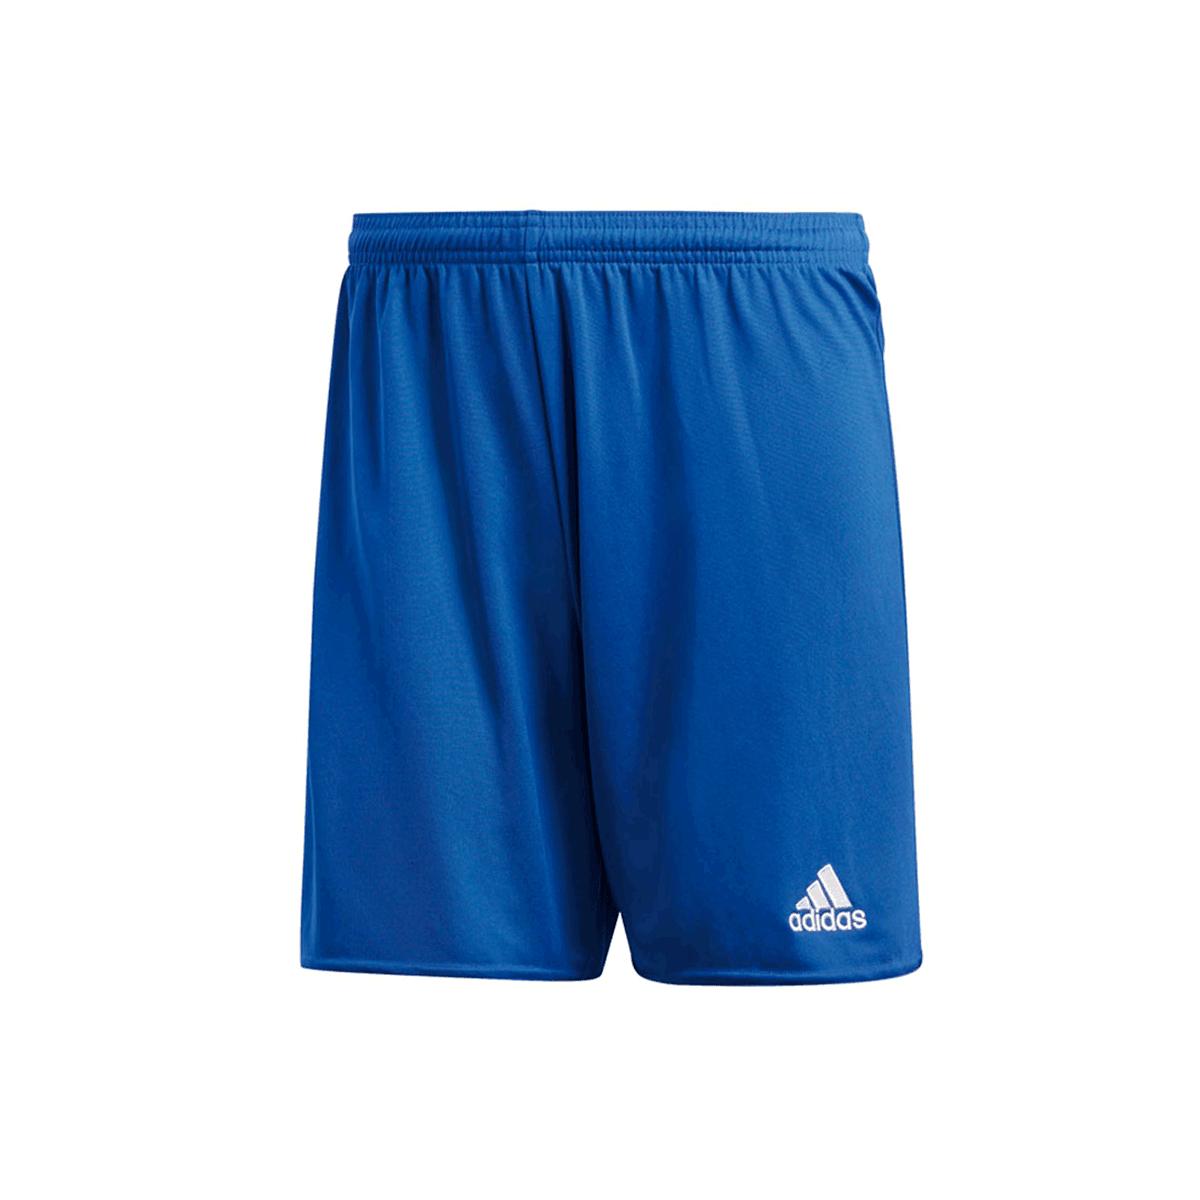 adidas Short Parma 16 blauweiß